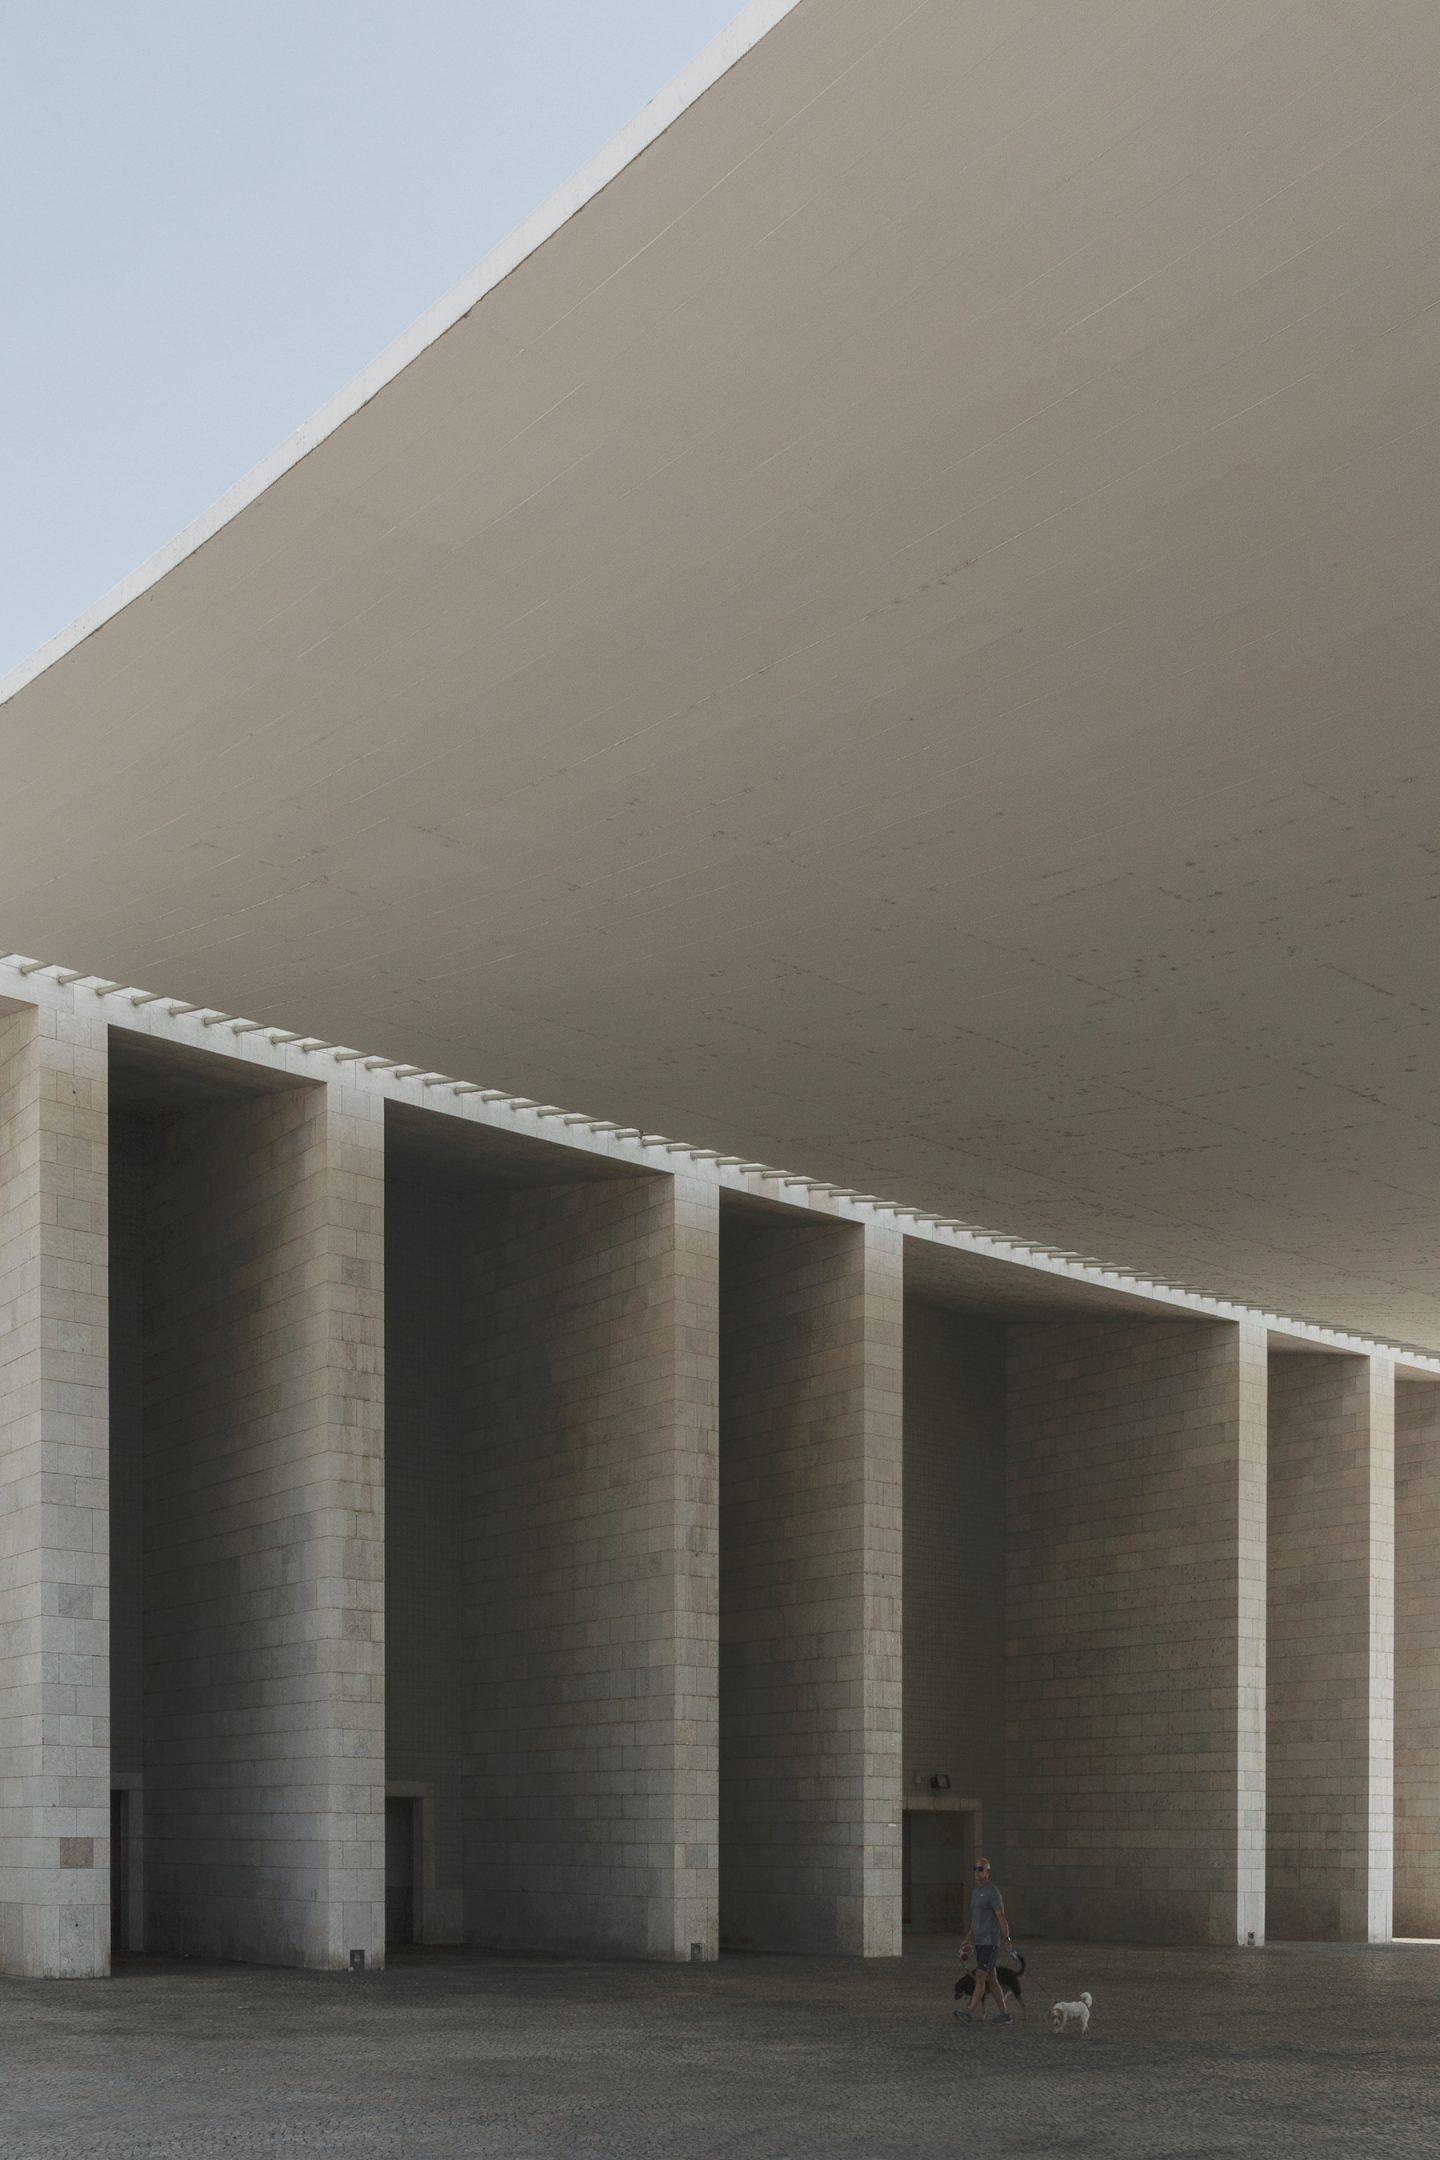 IGNANT-Architecture-Alvaro-Siza-Vieira-Portuguese-National-Pavilion-10